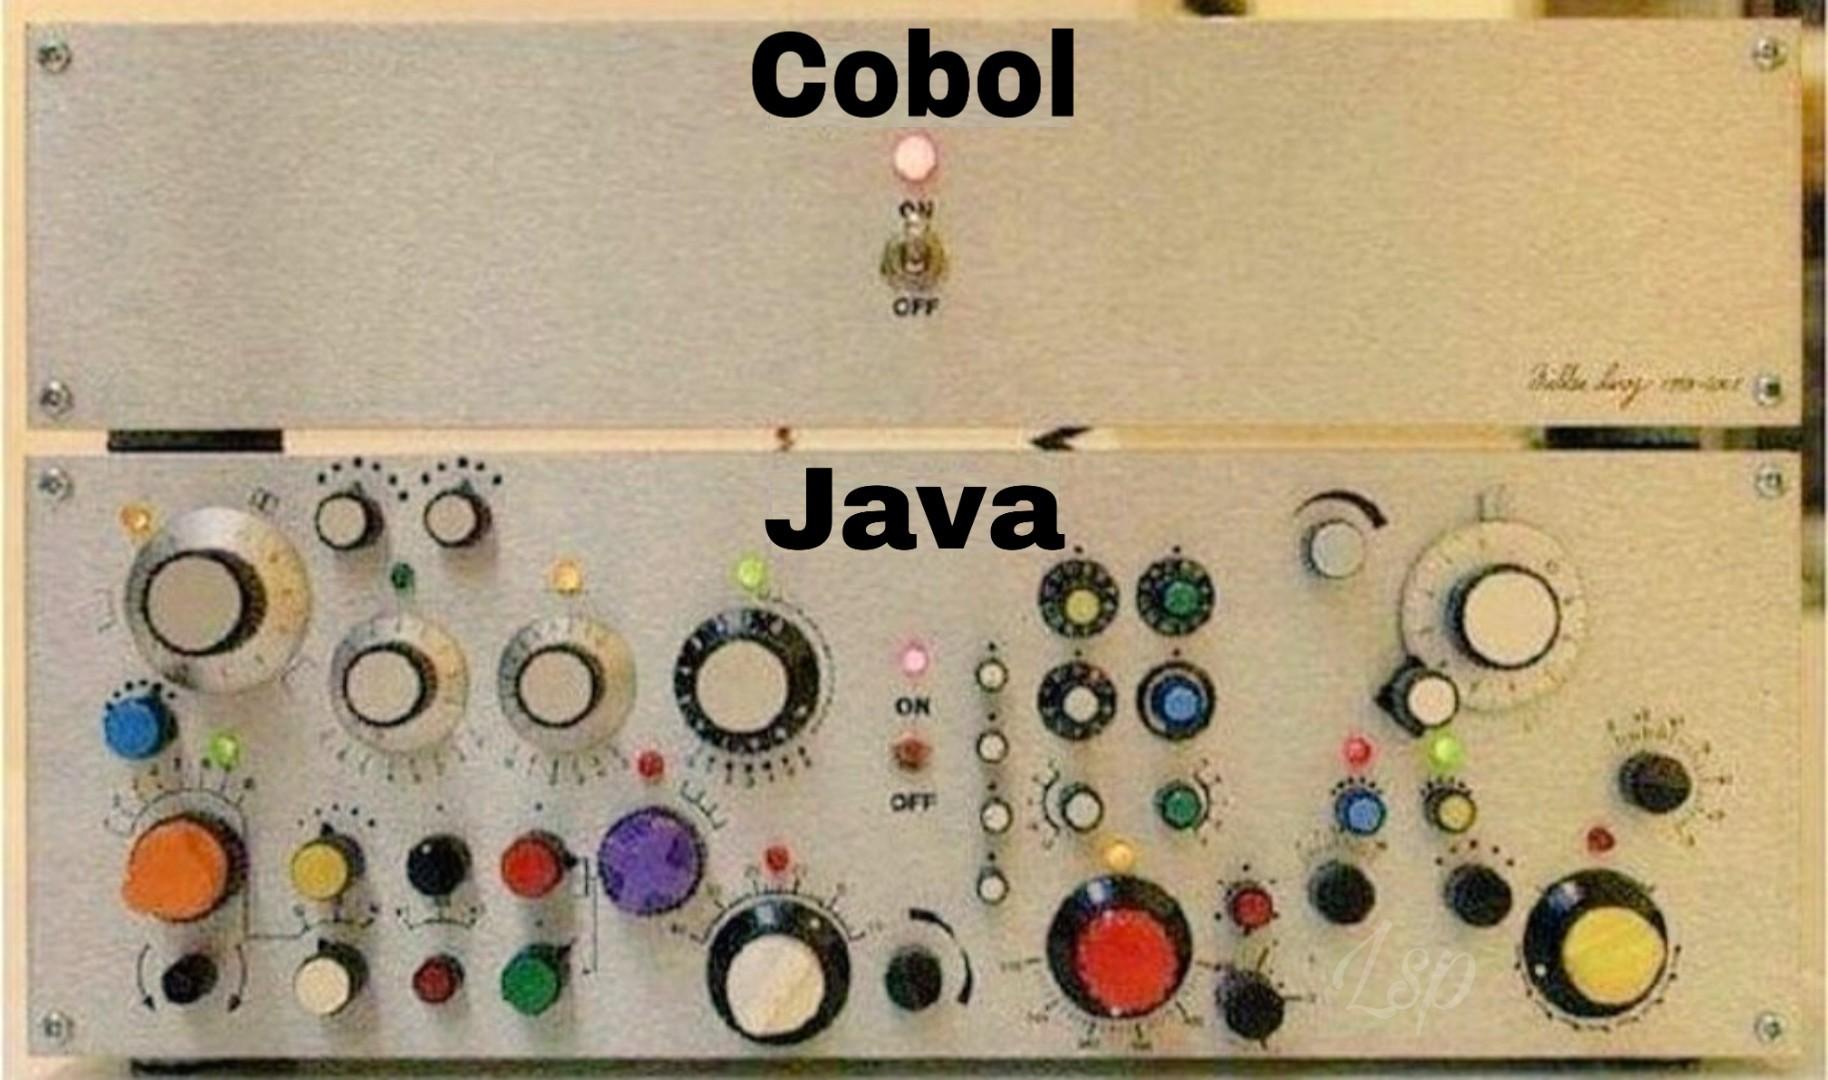 Bora programar - meme